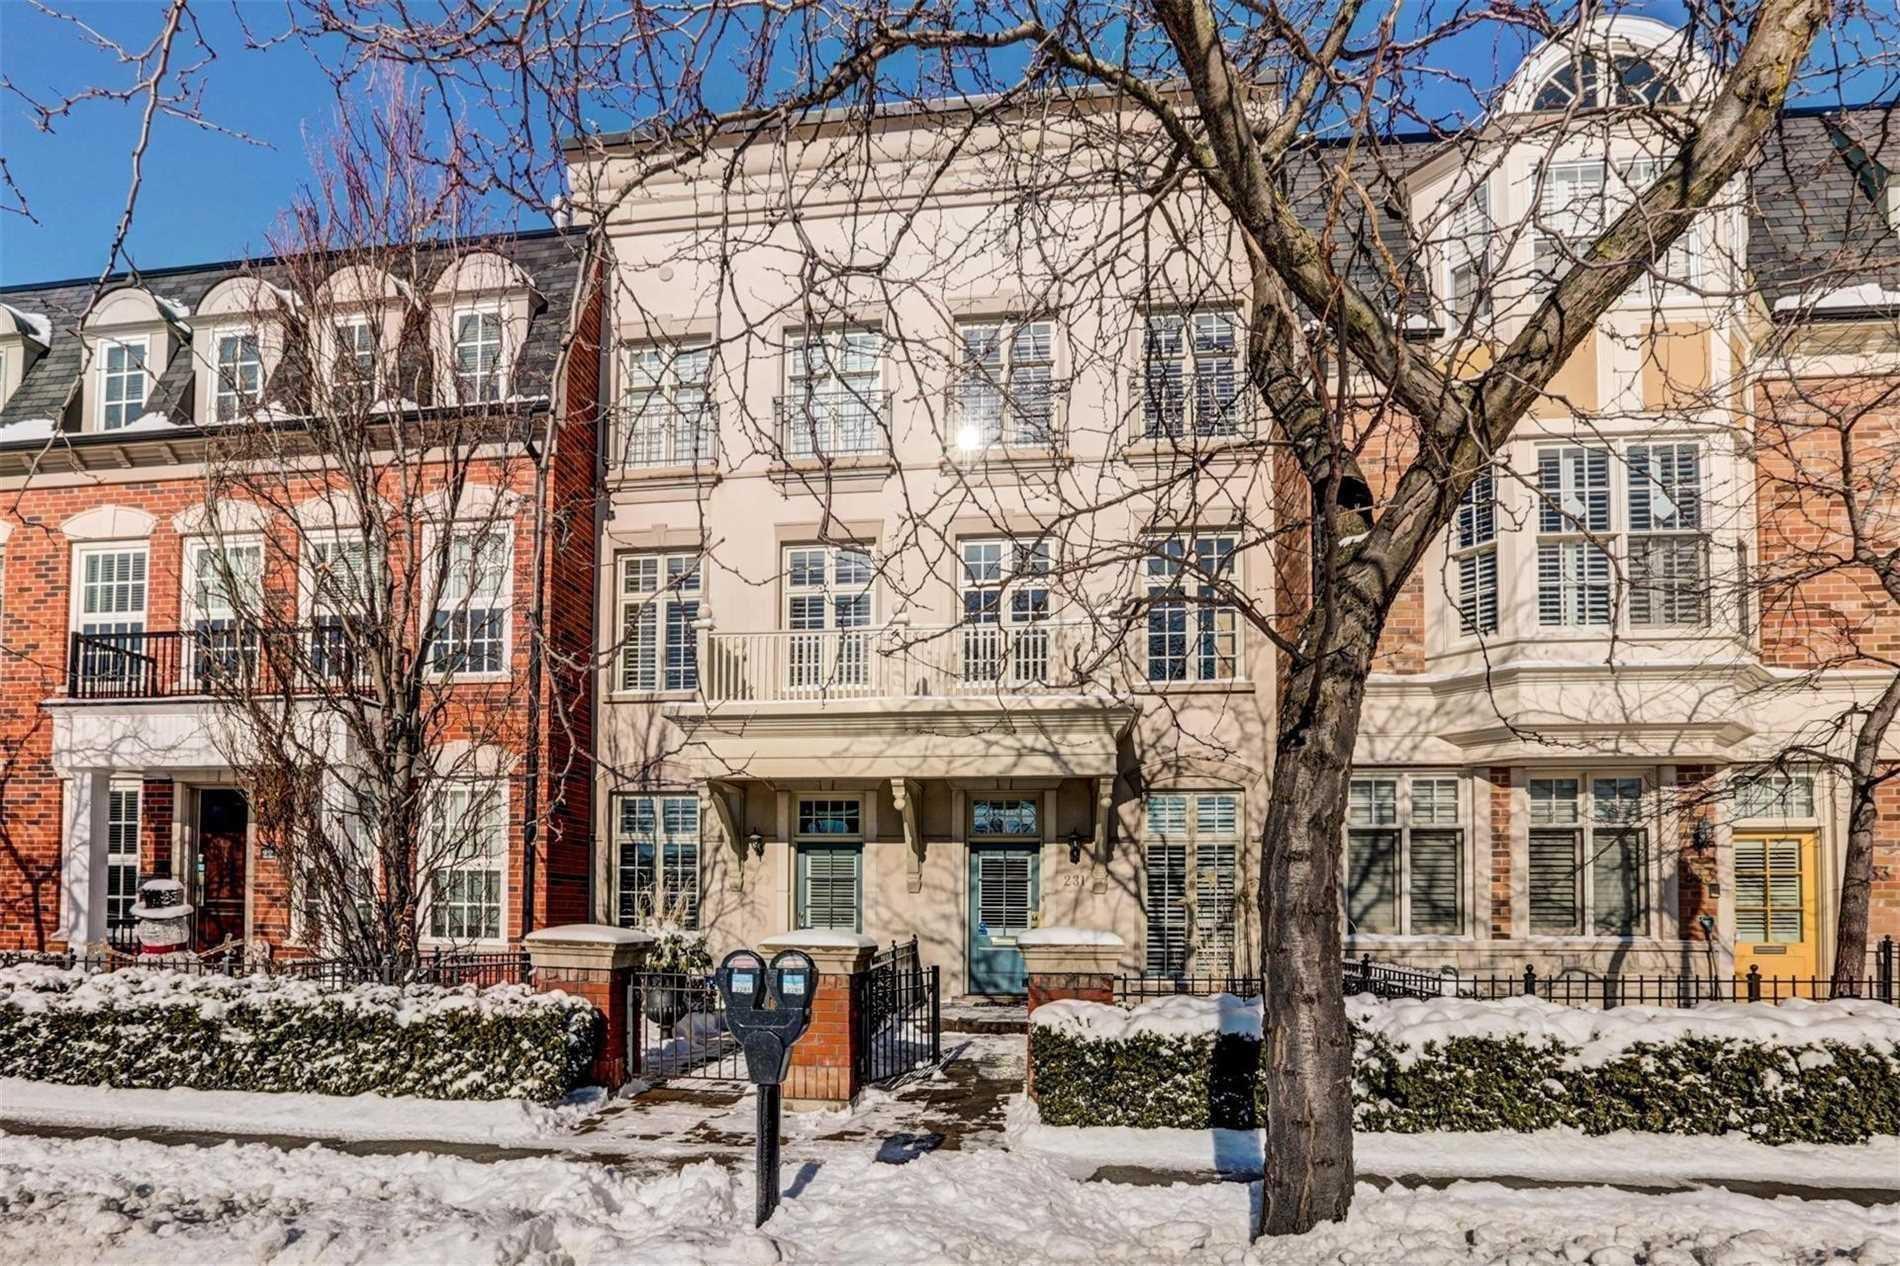 Main Photo: 231 Church Street in Oakville: Old Oakville House (3-Storey) for lease : MLS®# W4424340